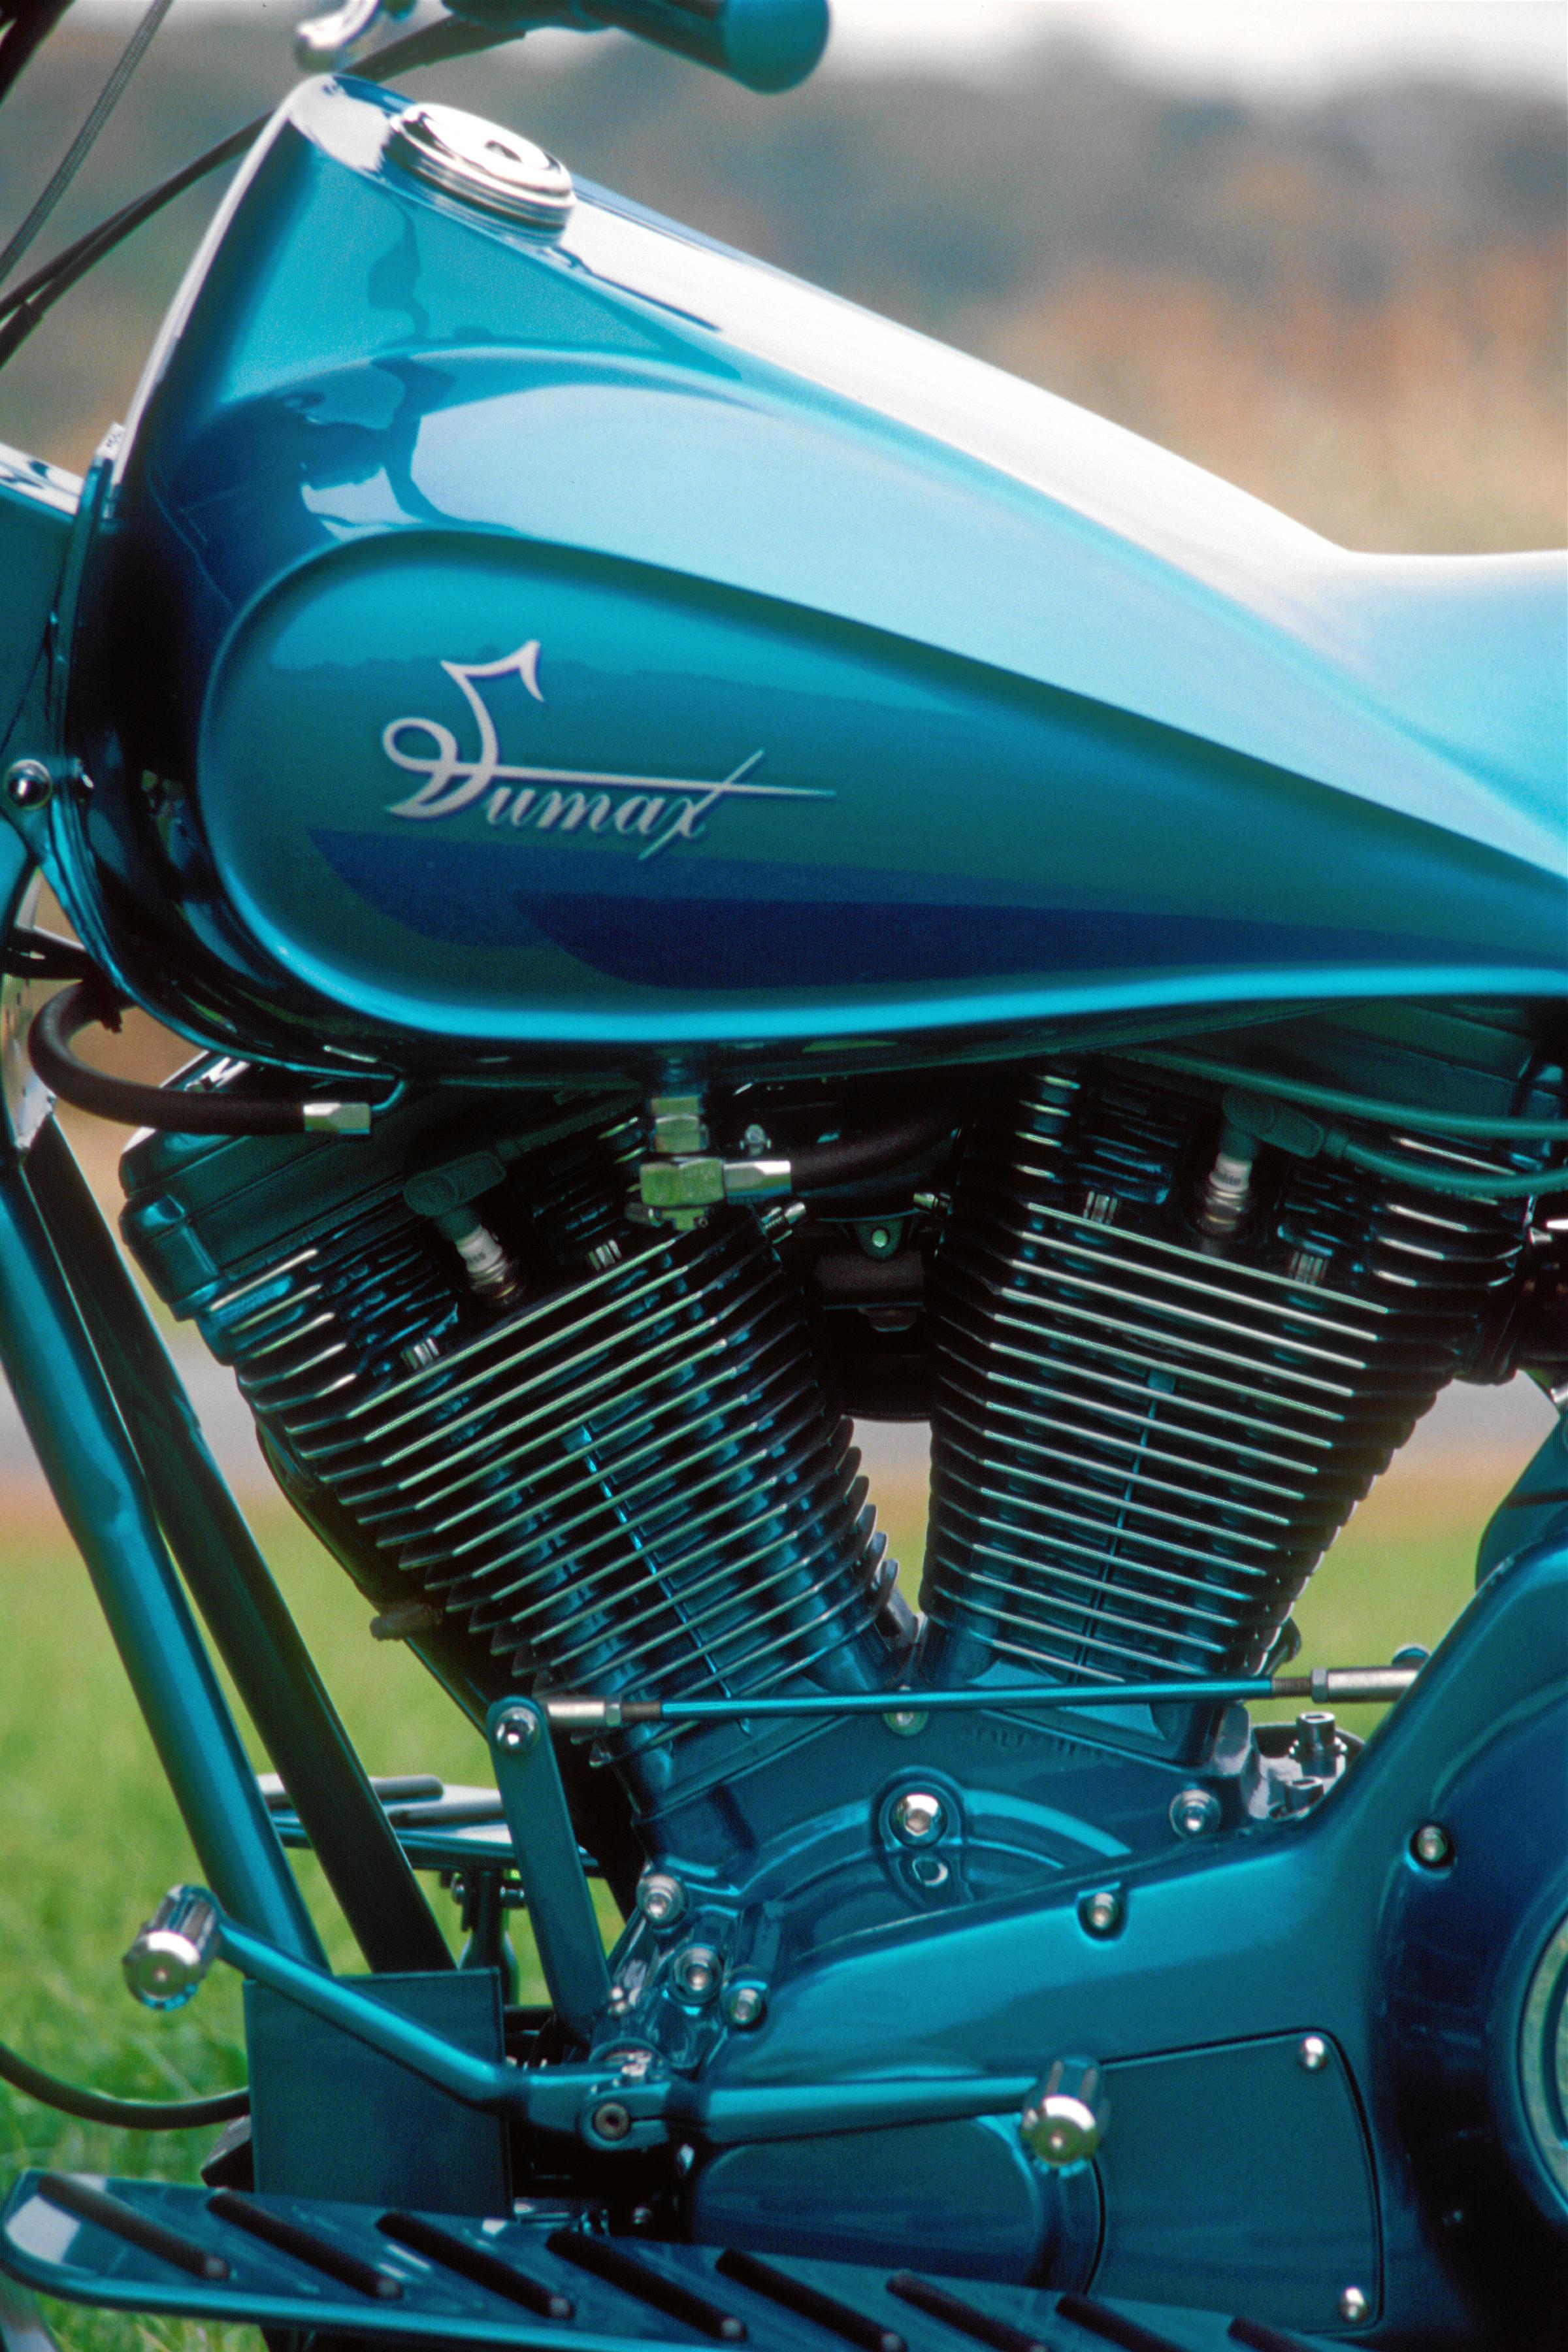 Powder Coating Harley Davidson® Evolution® Motors - Sumax